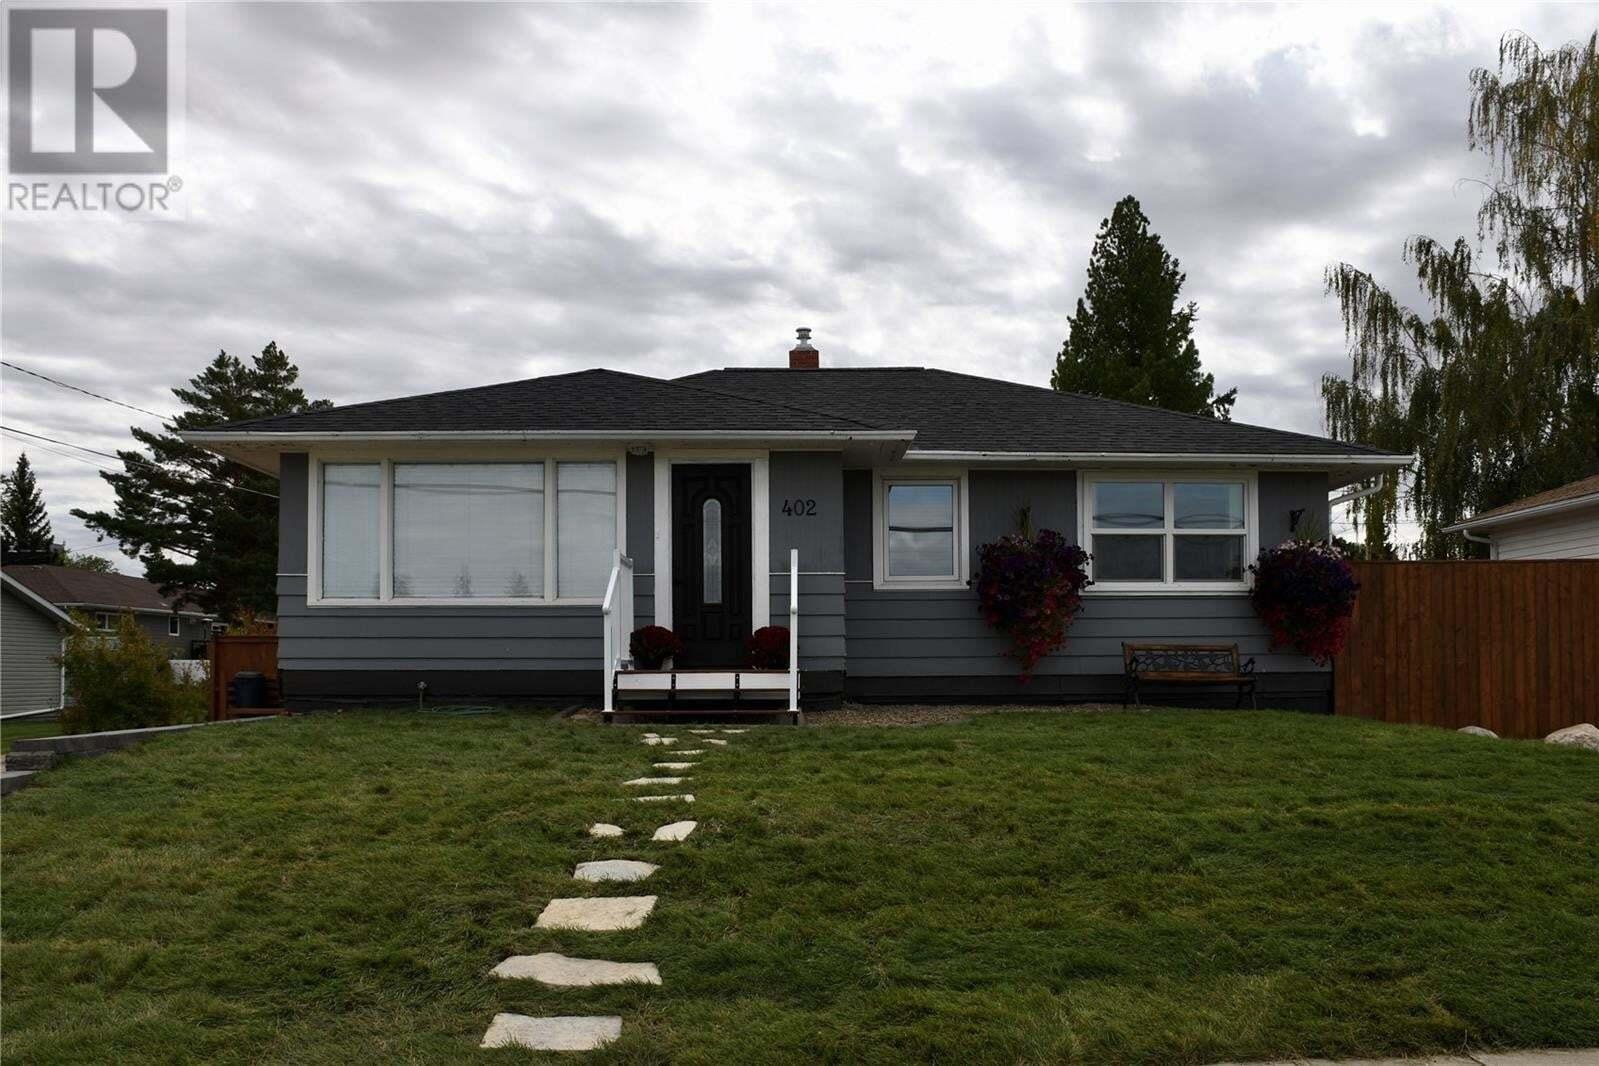 House for sale at 402 D Ave Wynyard Saskatchewan - MLS: SK826708